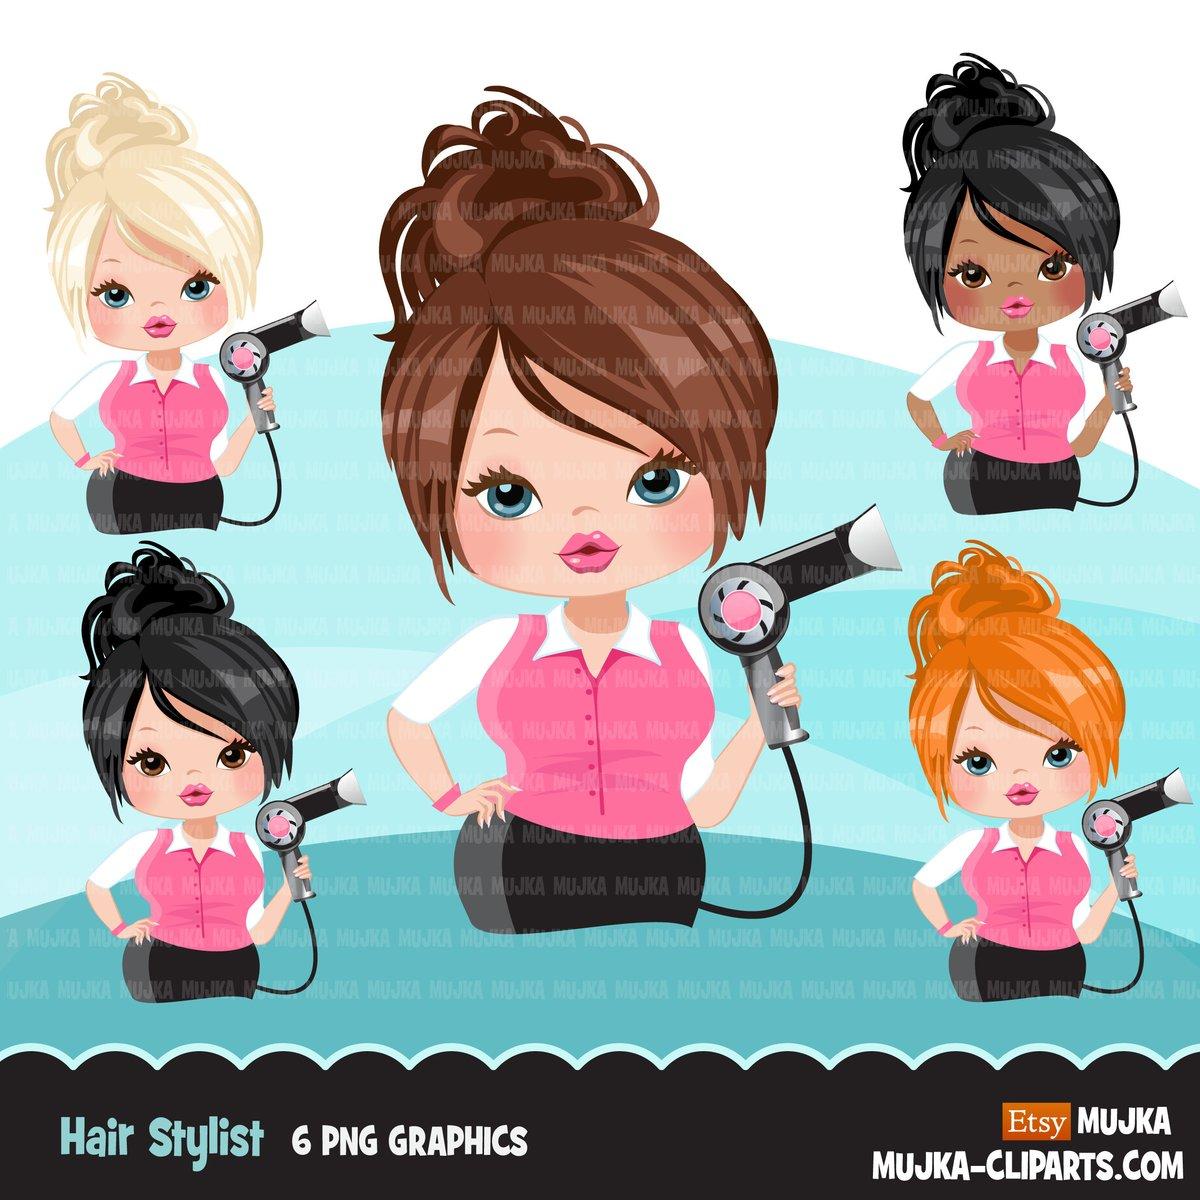 Hair stylist woman clipart avatar with hairdryer, print and cut, shop logo  boss hairdresser clip art graphics.